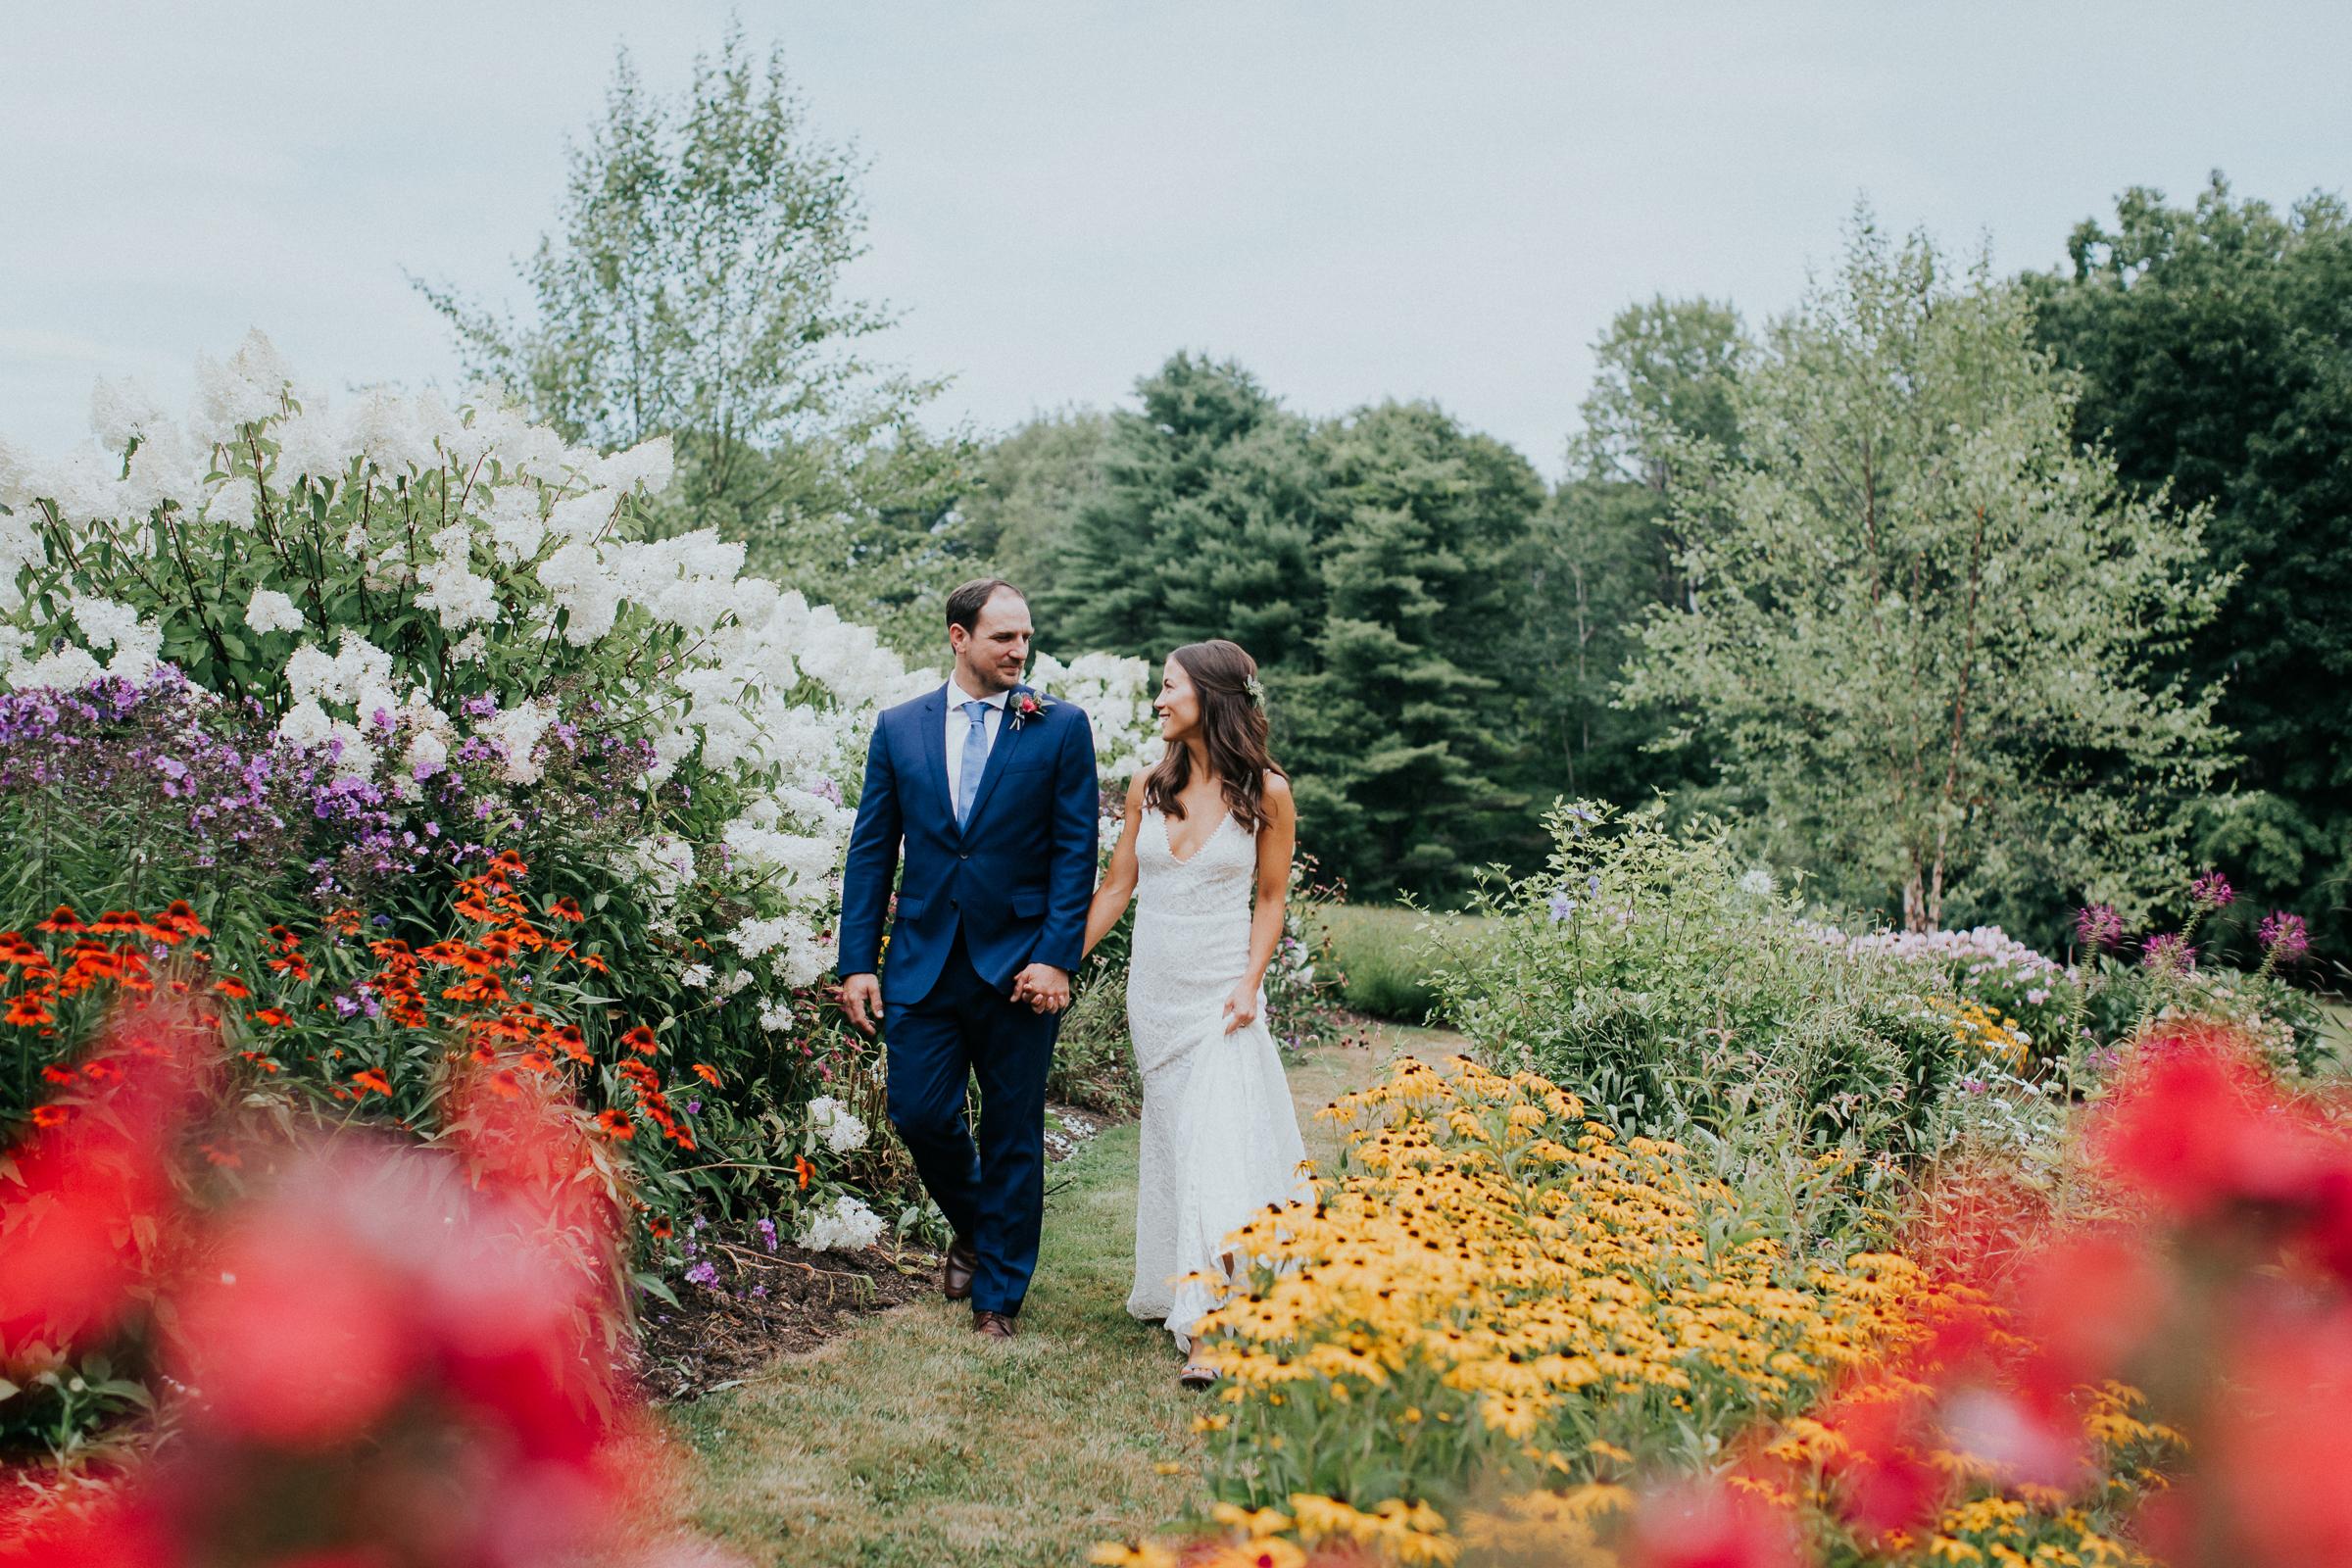 Marianmade-Farm-Wiscasset-Maine-Fine-Art-Documentary-Wedding-Photographer-Elvira-Kalviste-Photography-39.jpg